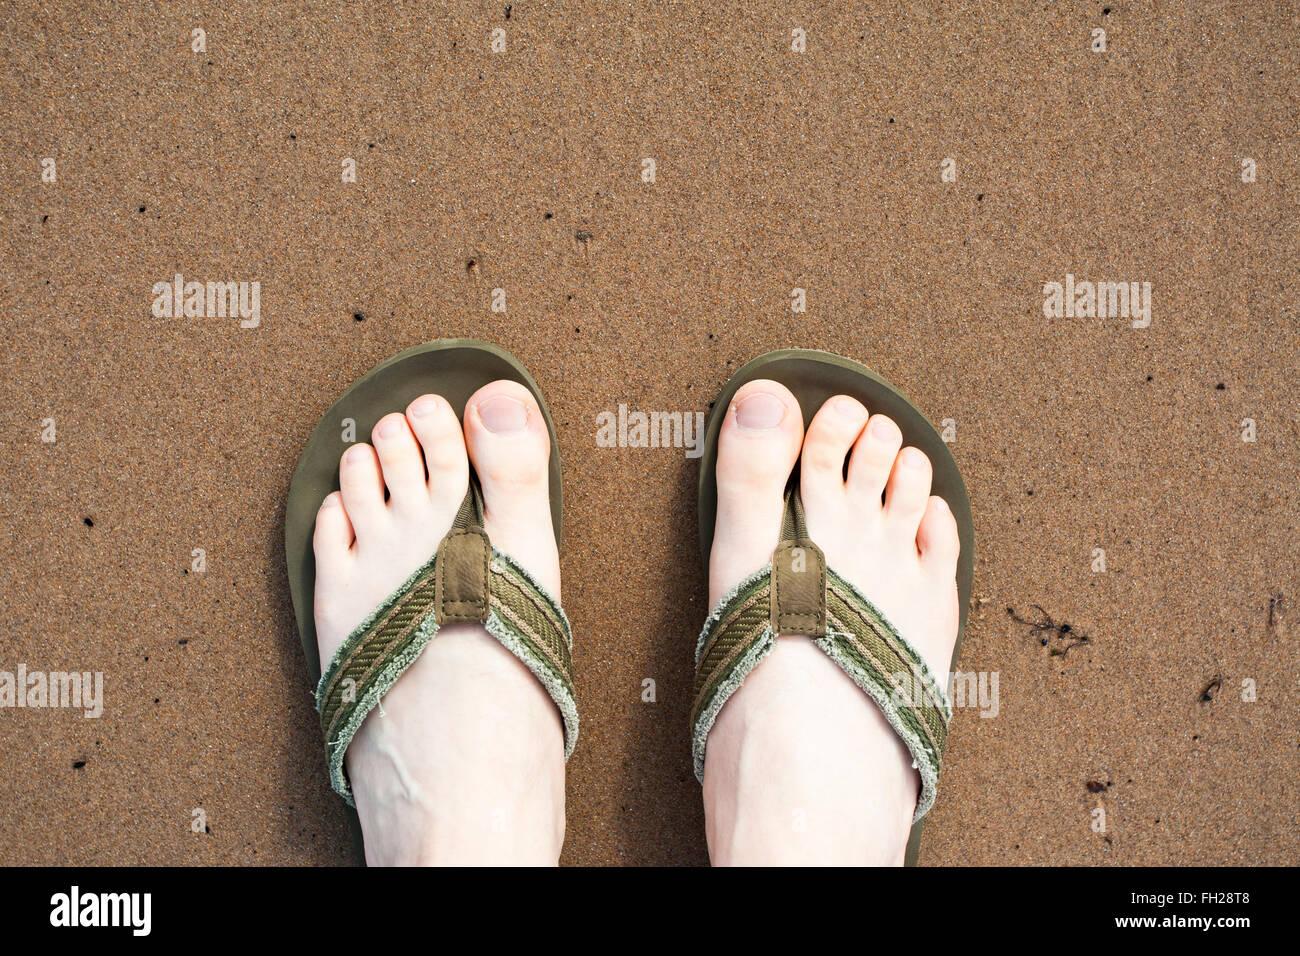 3c5194498 Wearing Flip Flops Stock Photos   Wearing Flip Flops Stock Images ...